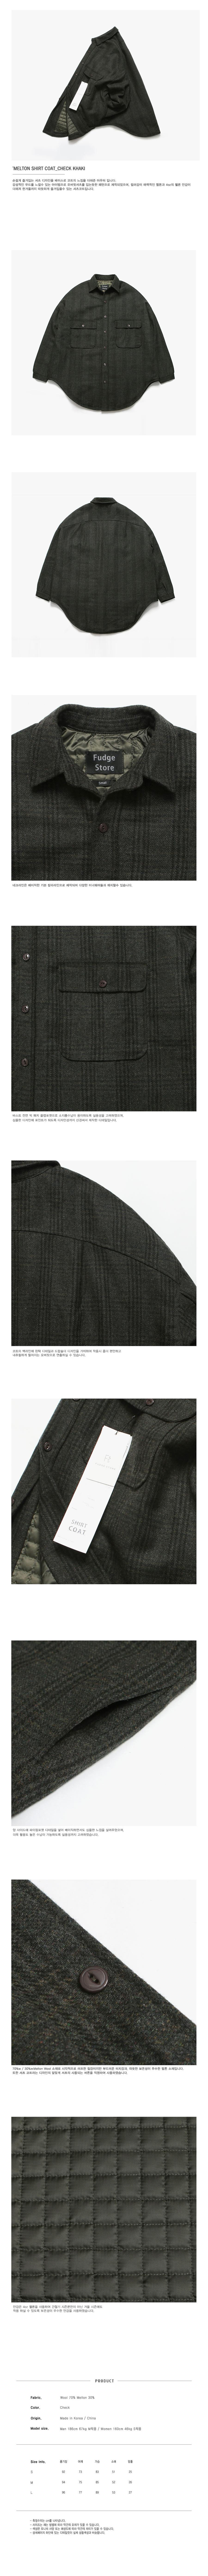 melton_shirt_coat_check_khaki_02.jpg